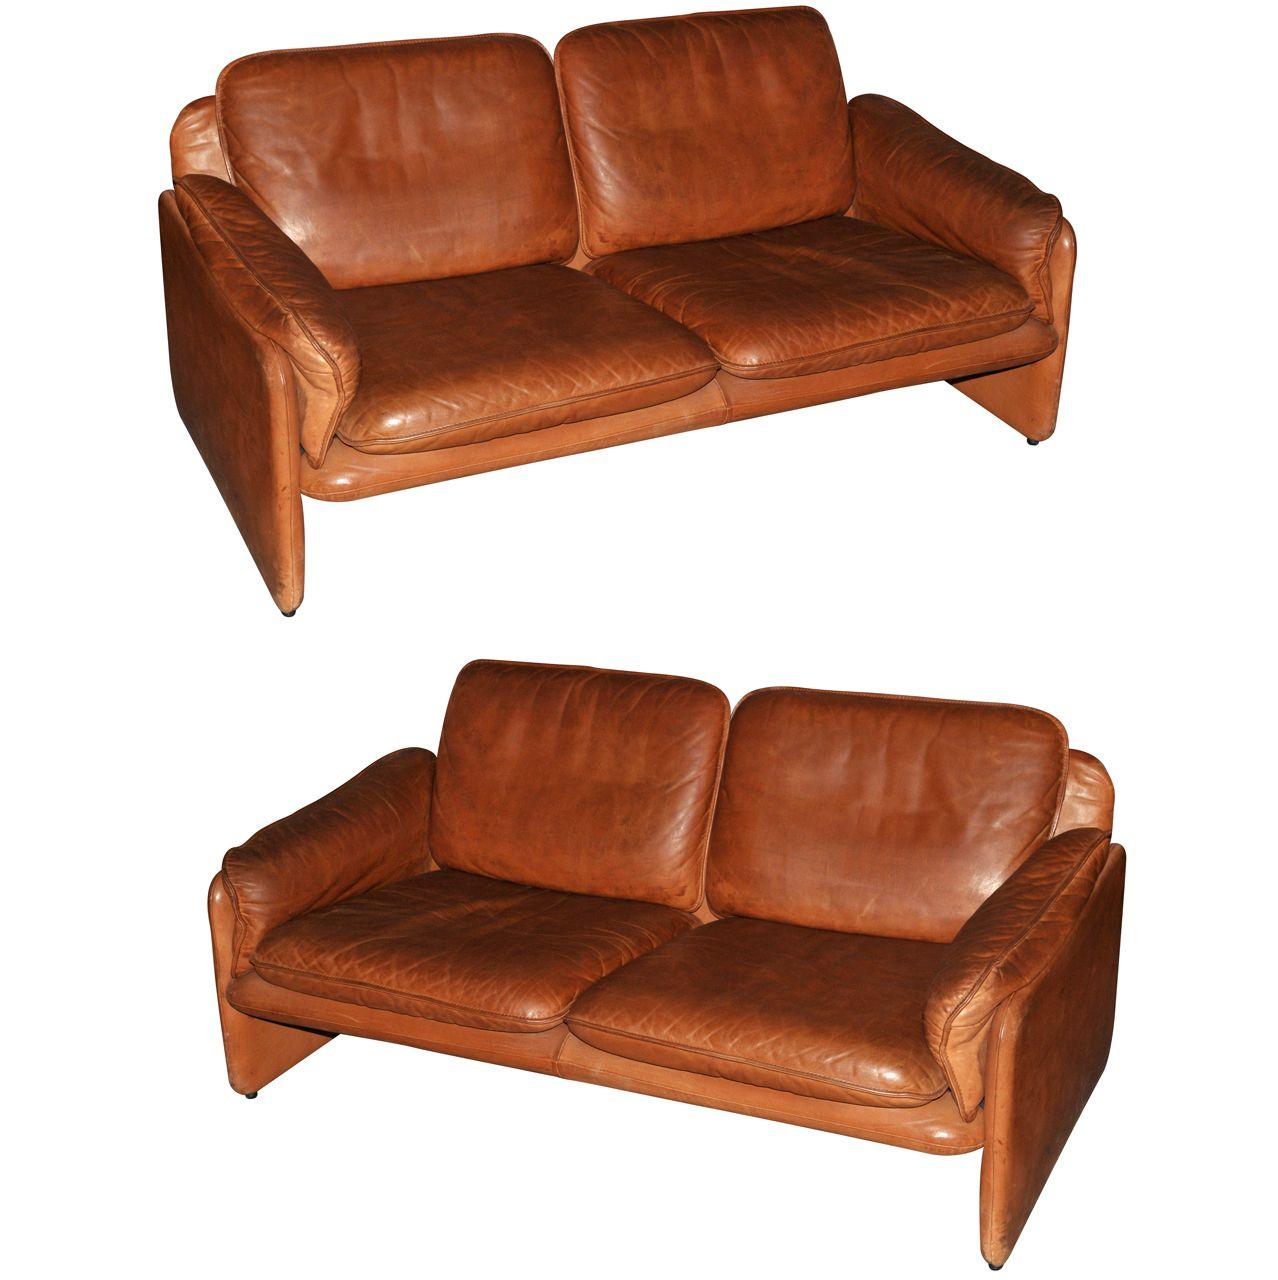 Two 1970s Sofas by De Sede